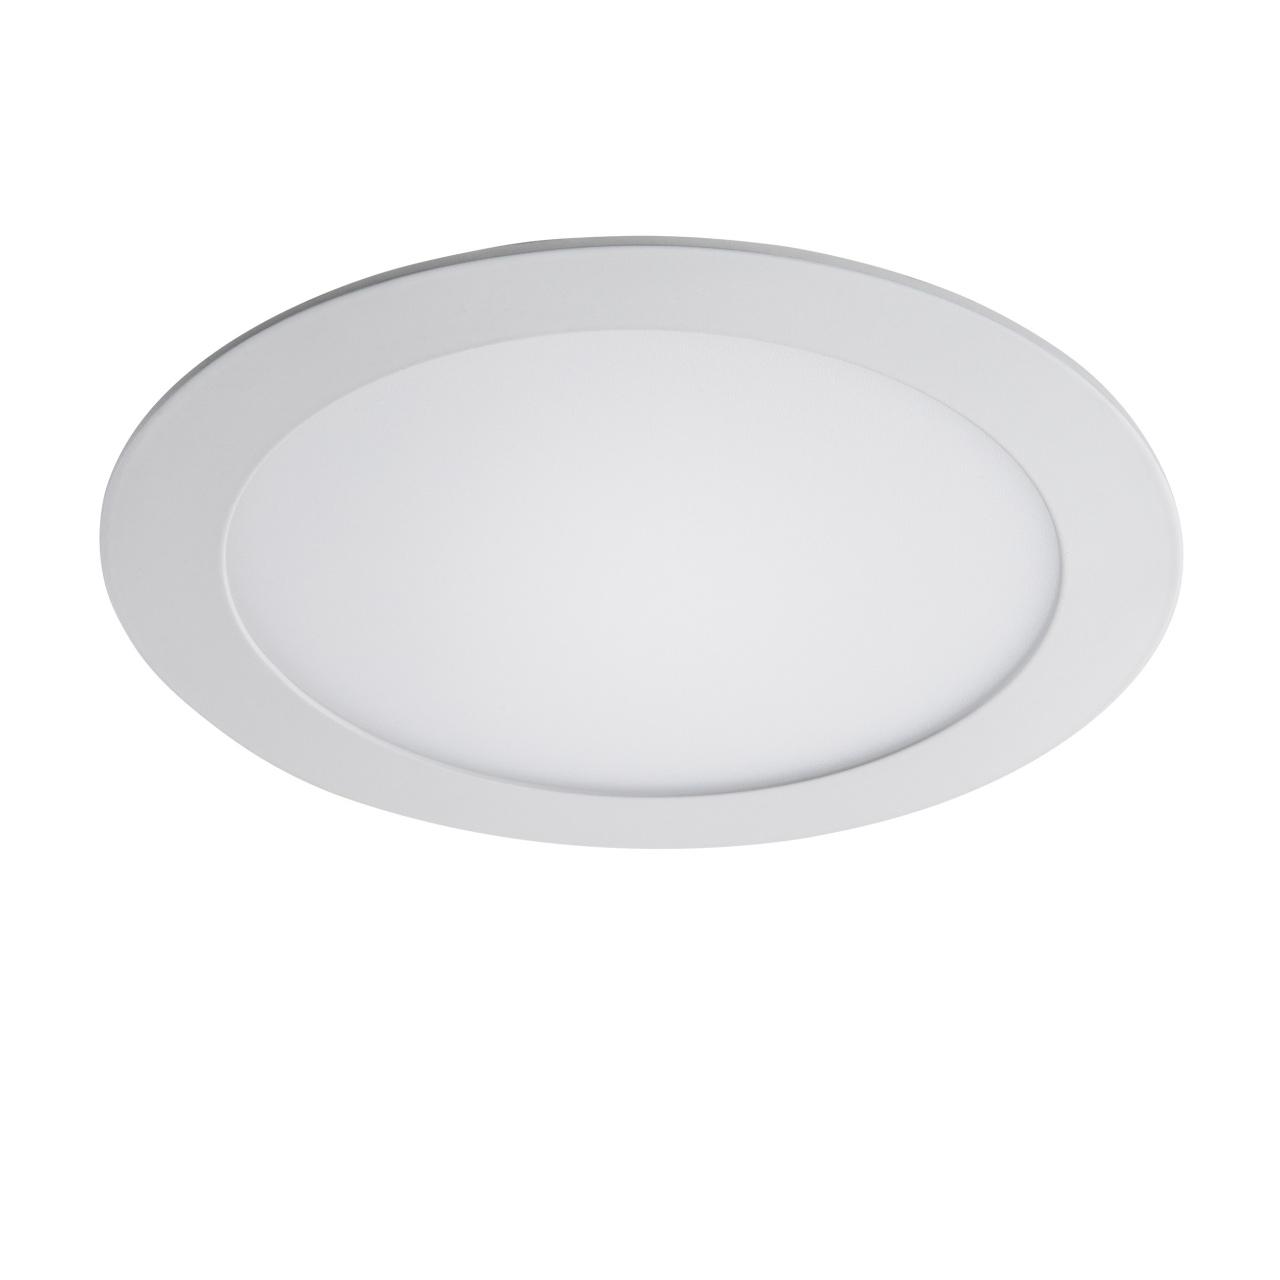 Светильник Zocco LED 18W 900LM 4000K Lightstar 223184